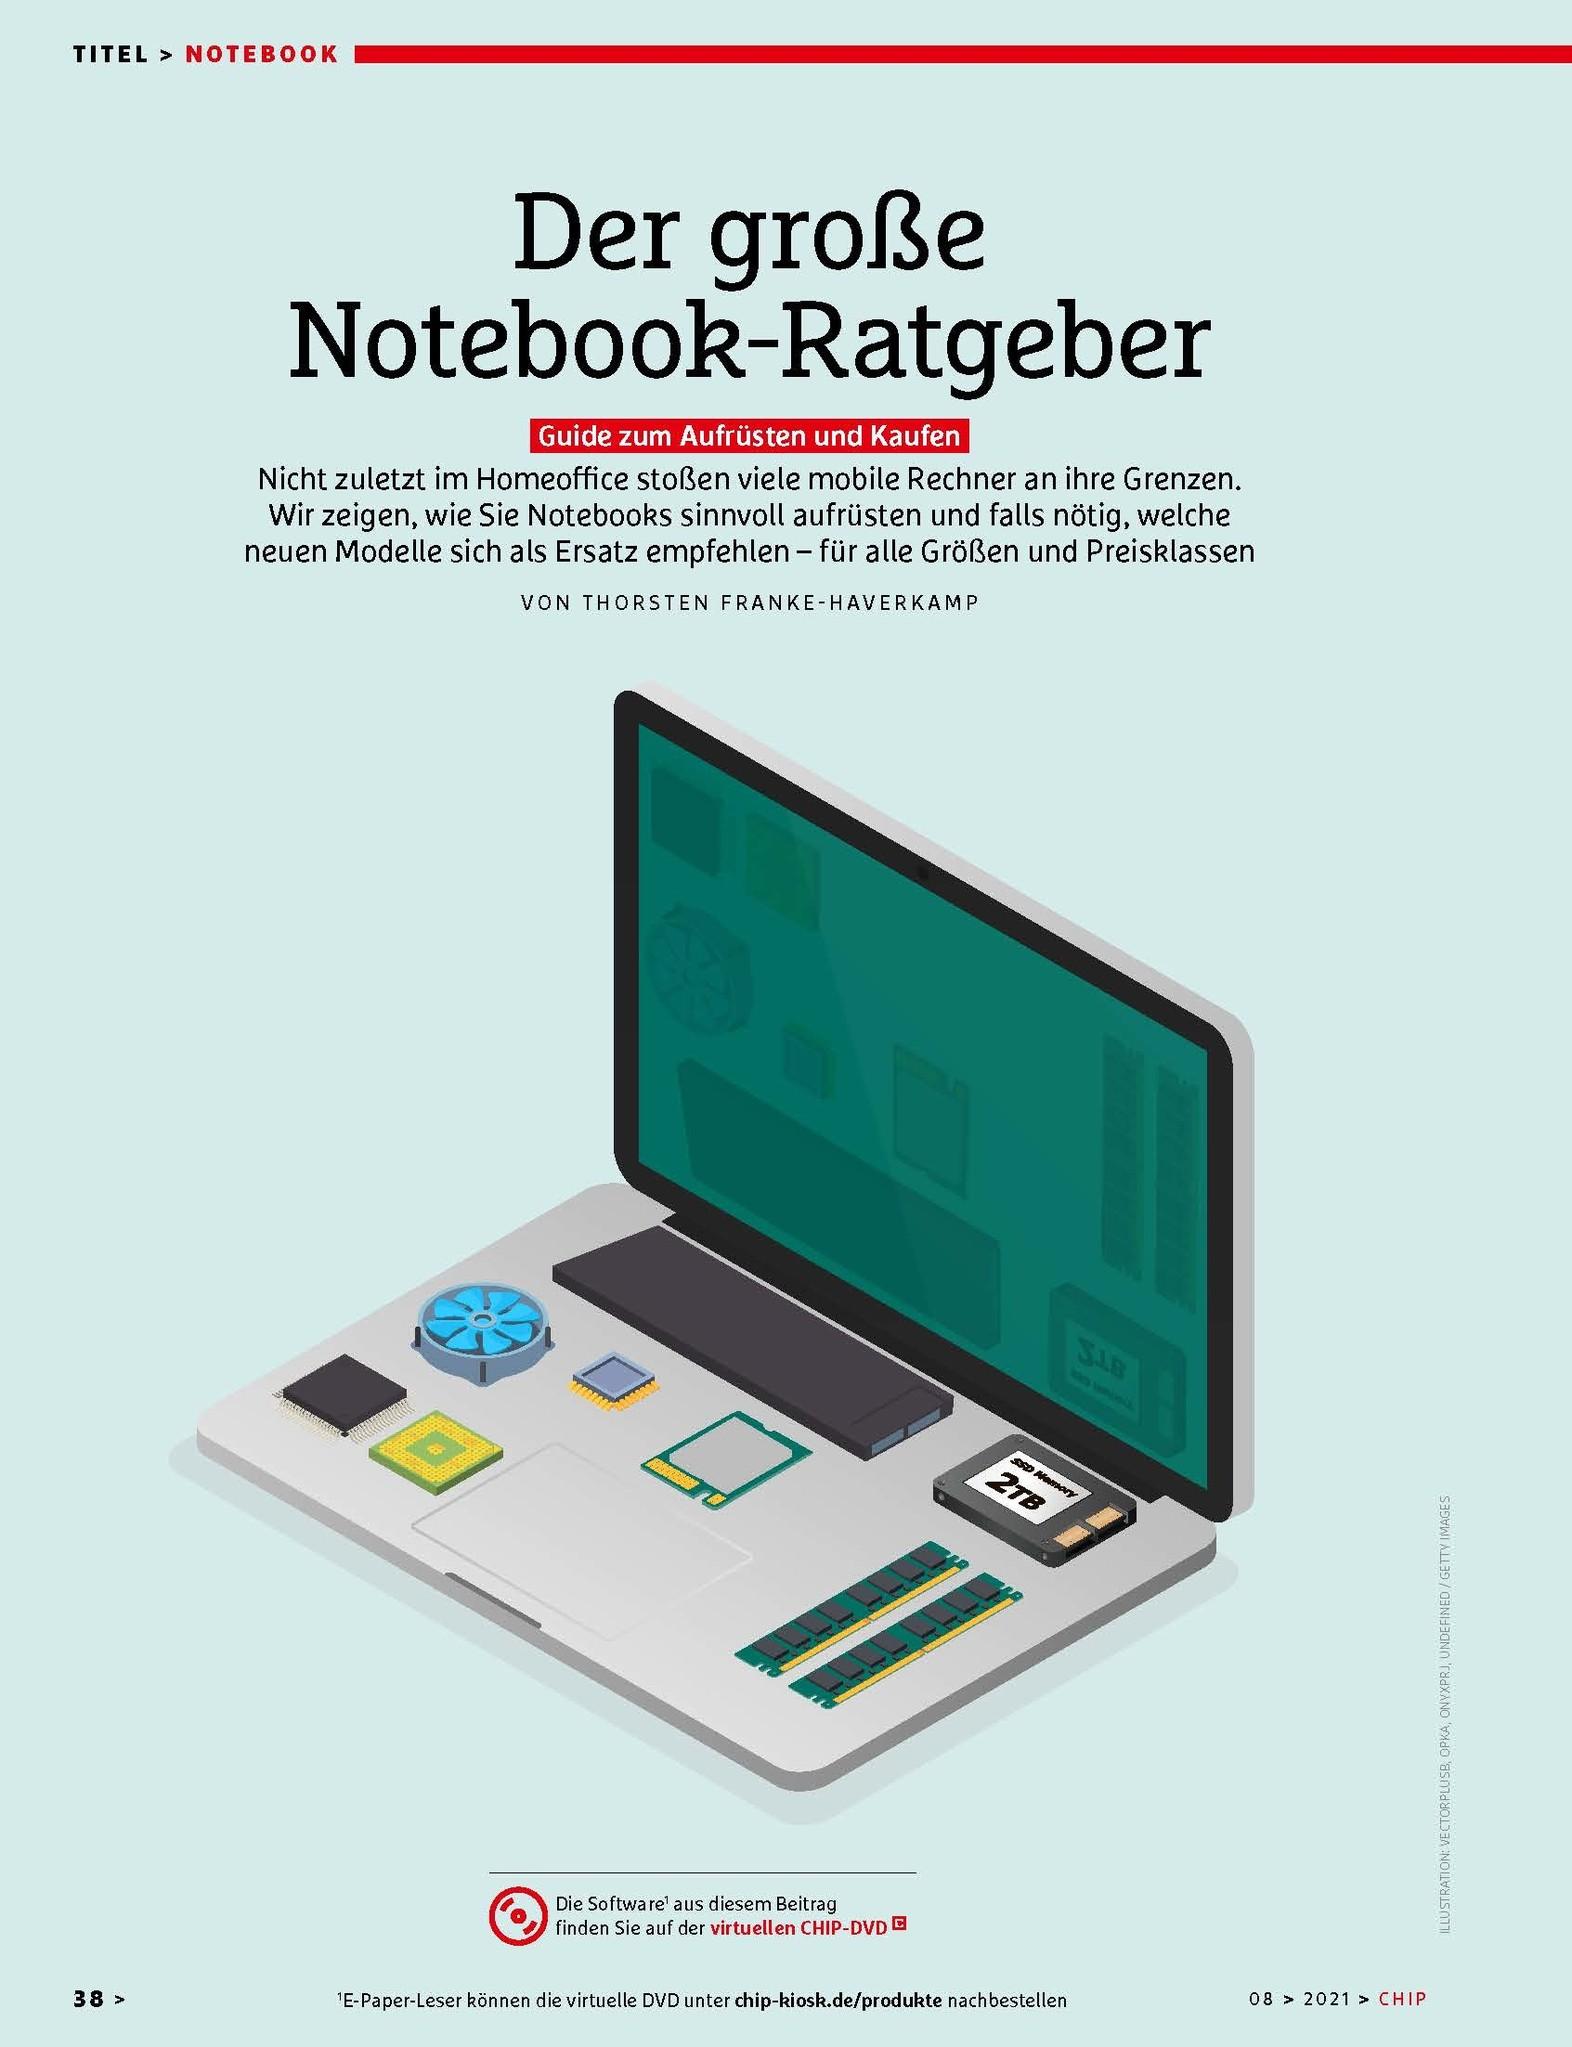 CHIP CHIP Plus – Laptop-Tuning versus Neukauf